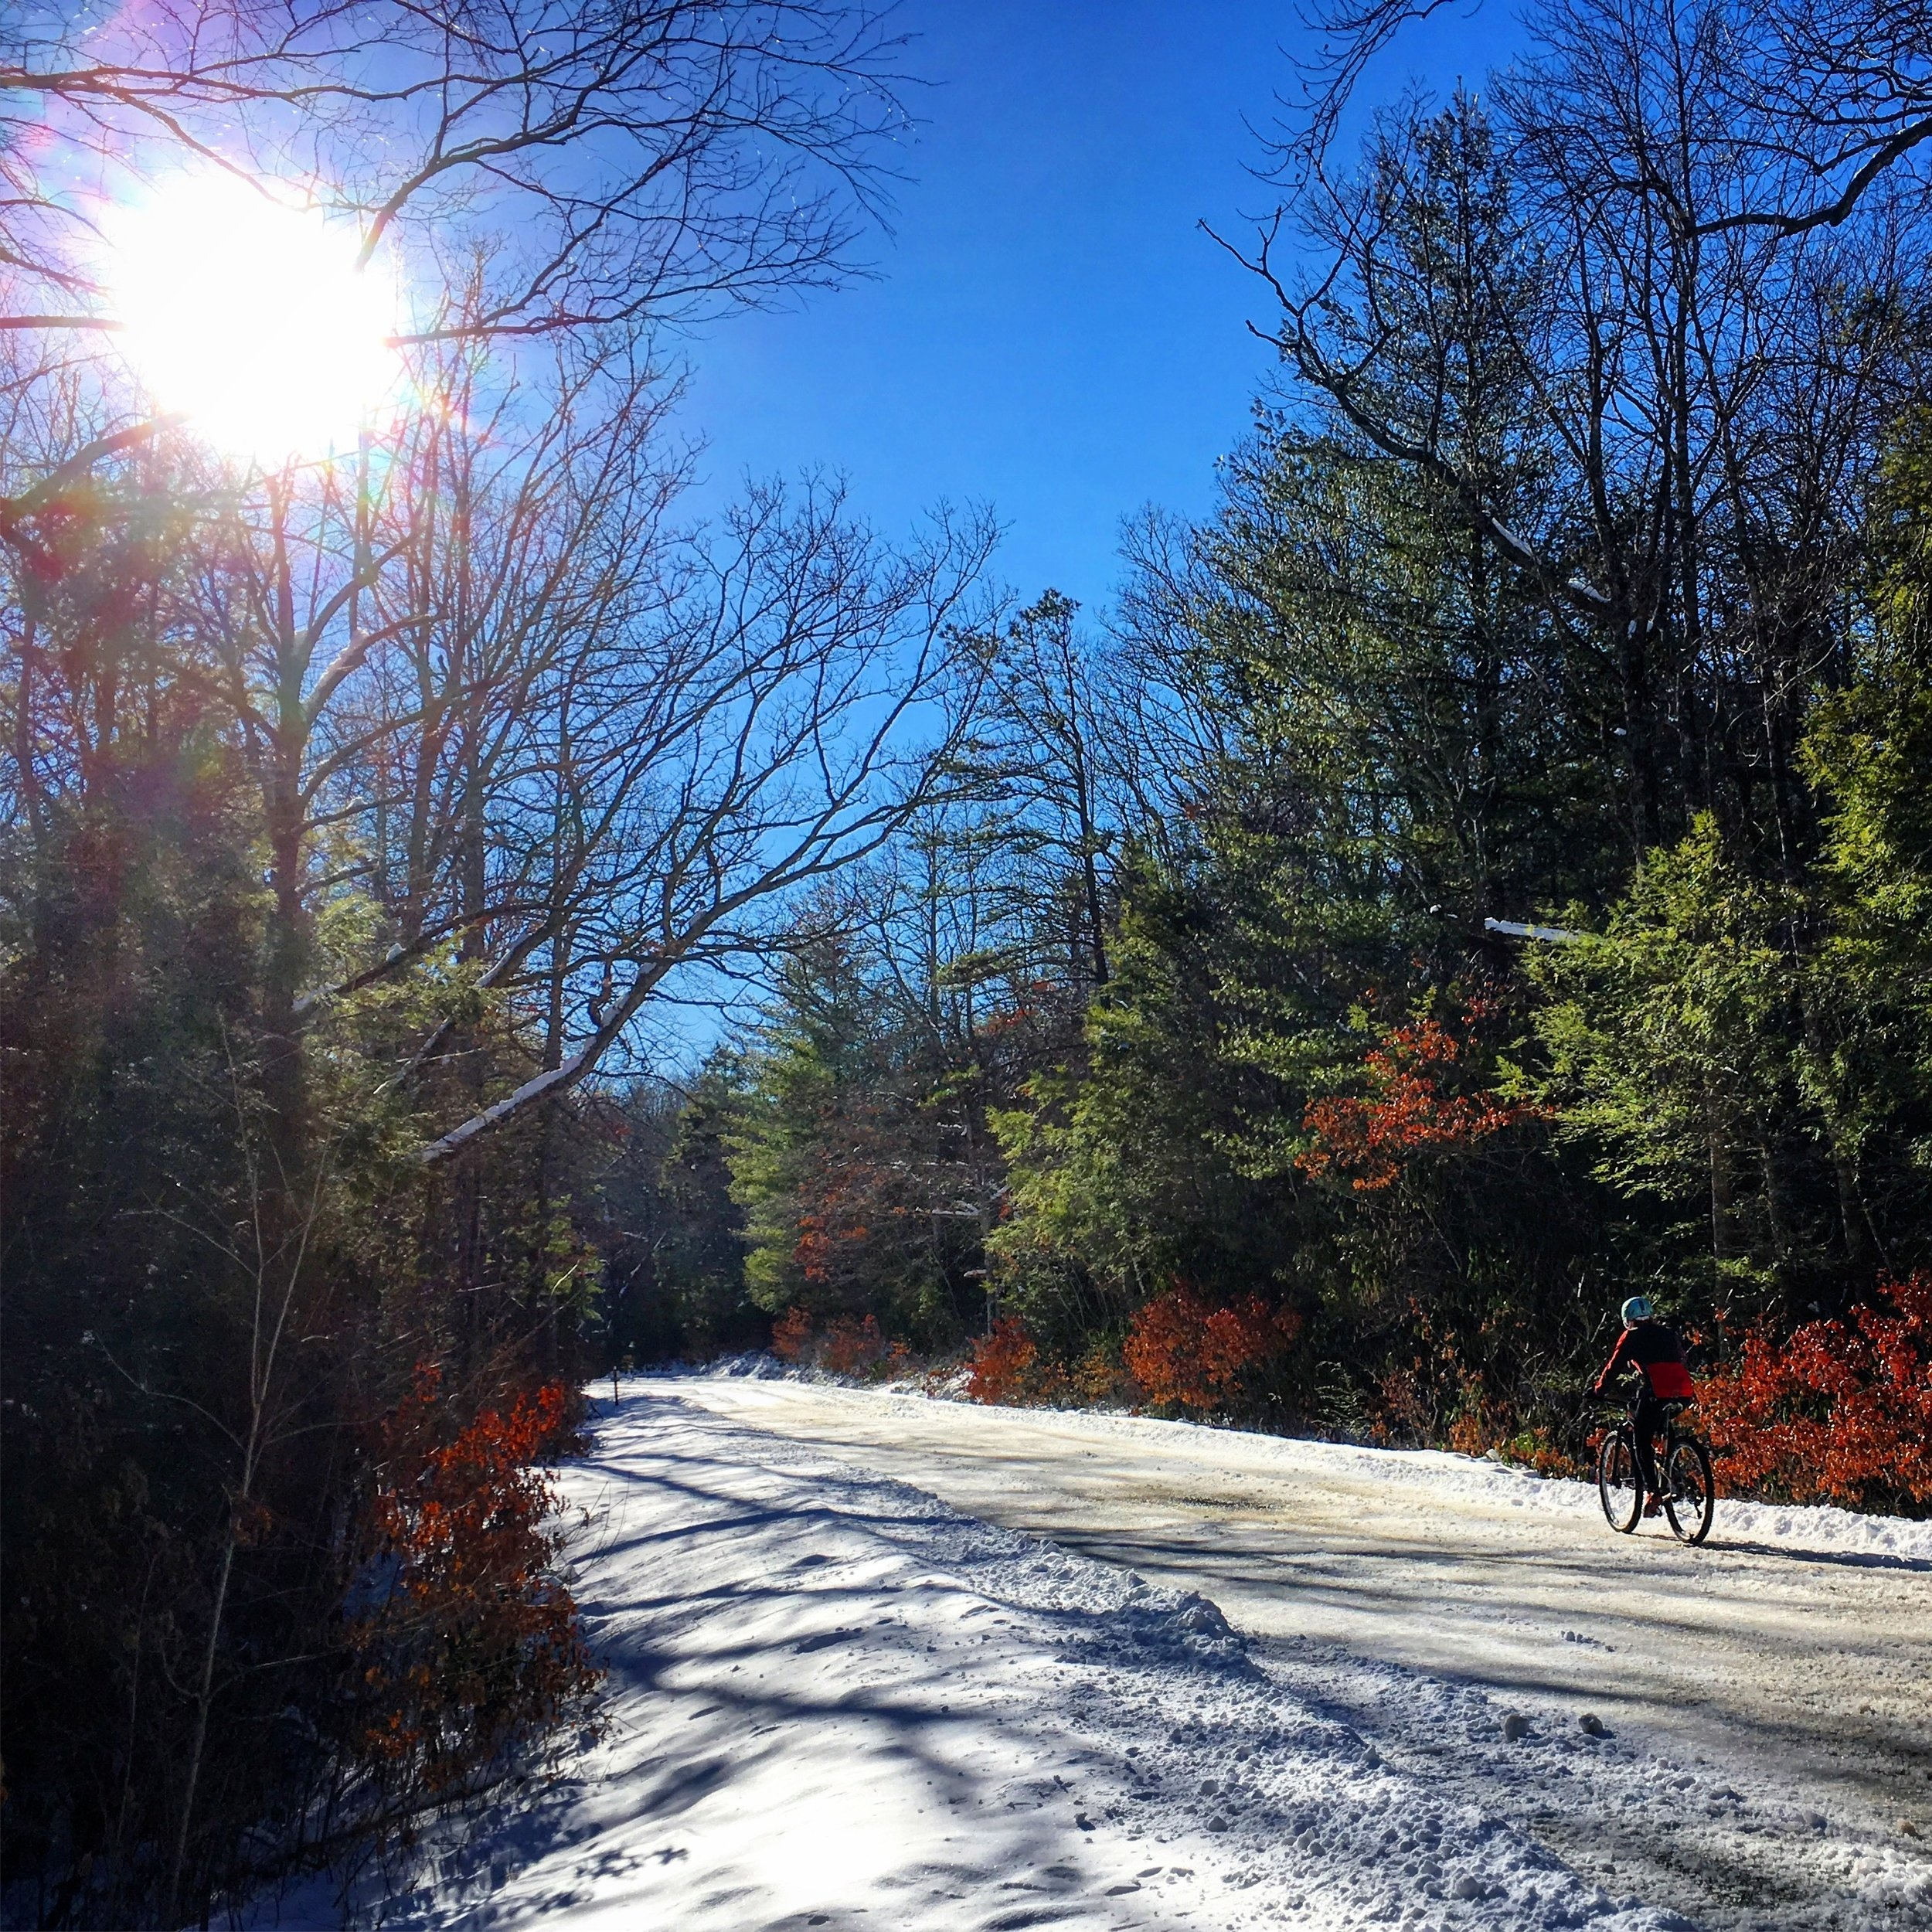 Jenna cruising on some icy Pisgah roads!